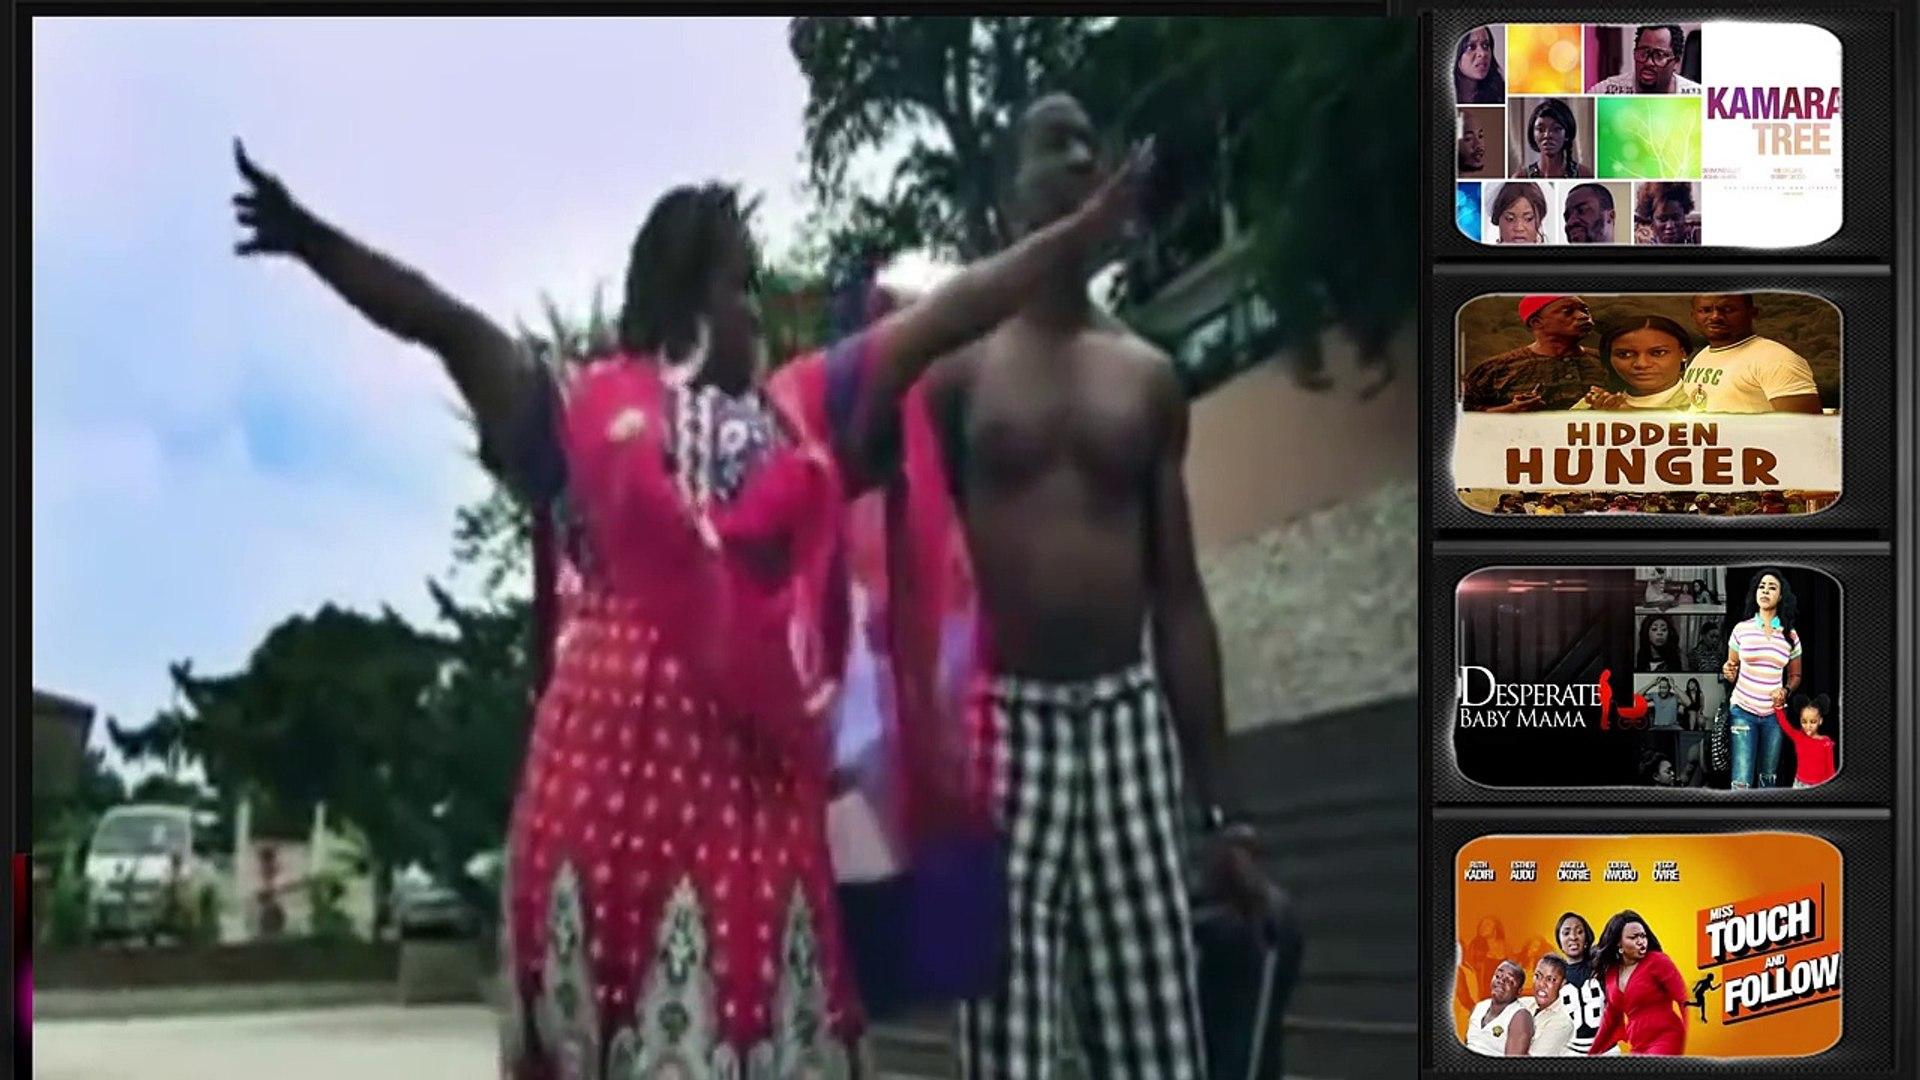 Kamaras Tree (Official Trailer) Latest Nigeria Nollywood Drama Movie